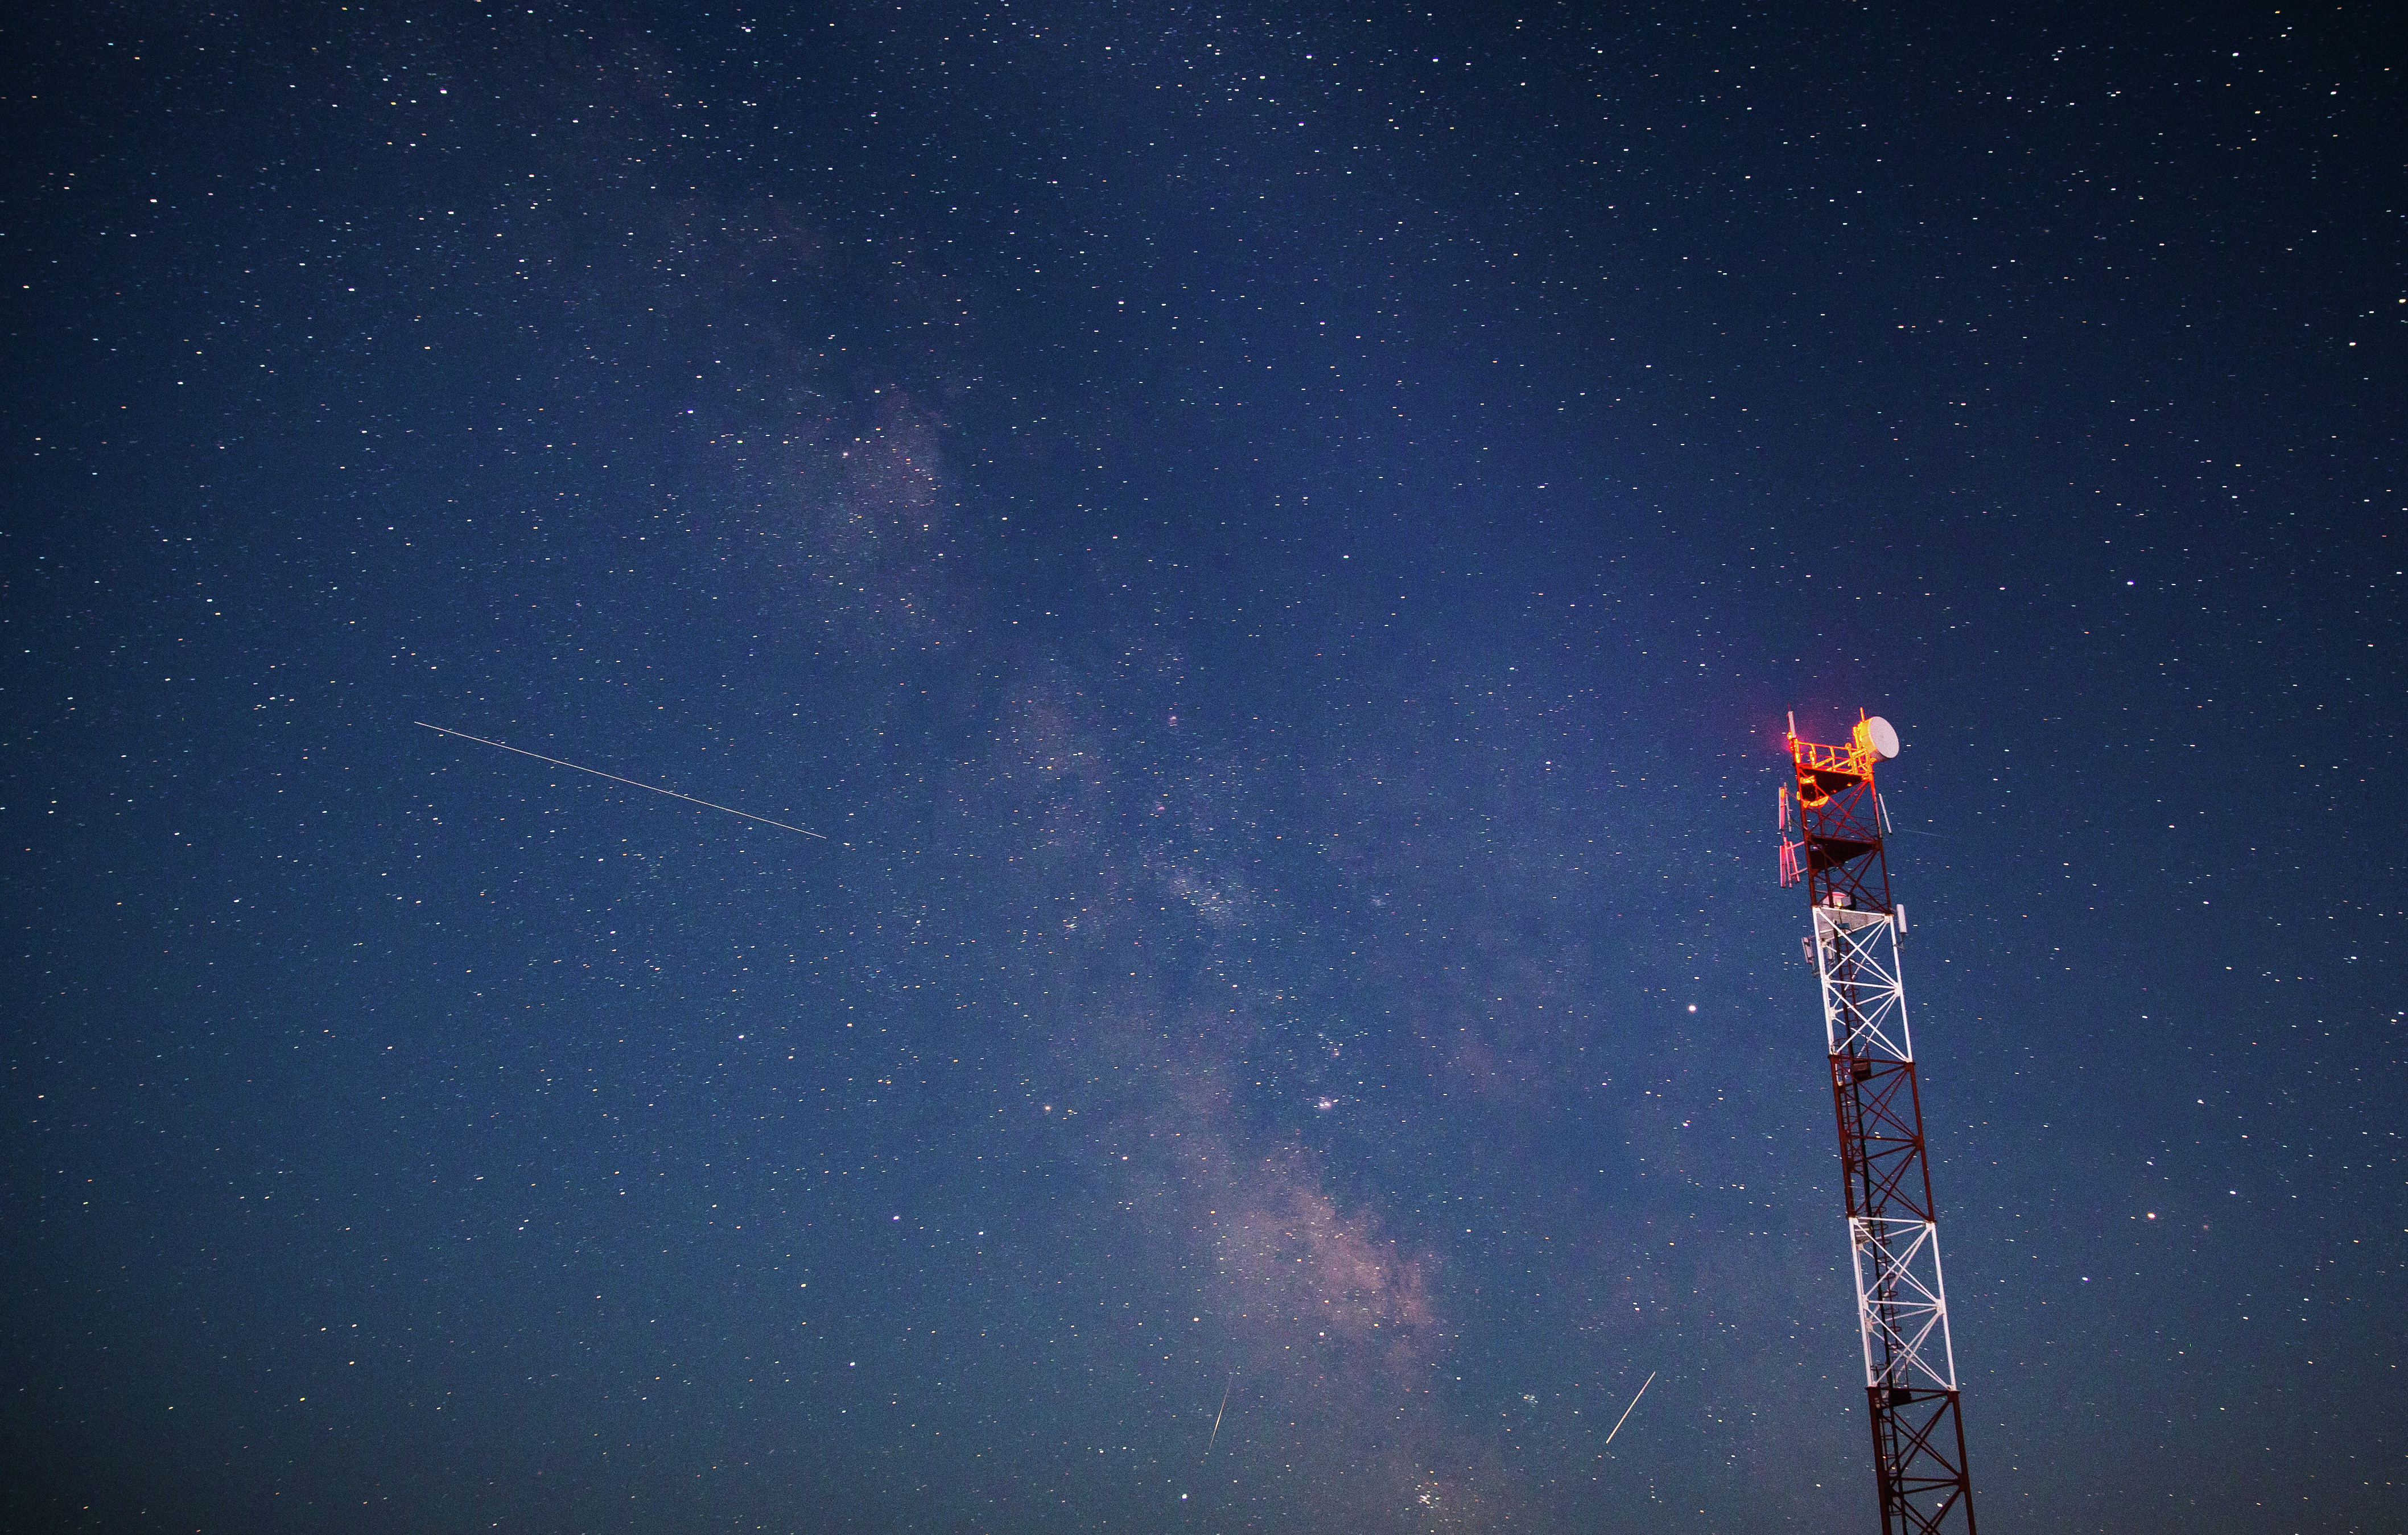 <p>Звездное небо в Краснодарском крае. Фото: &copy; РИА Новости</p>